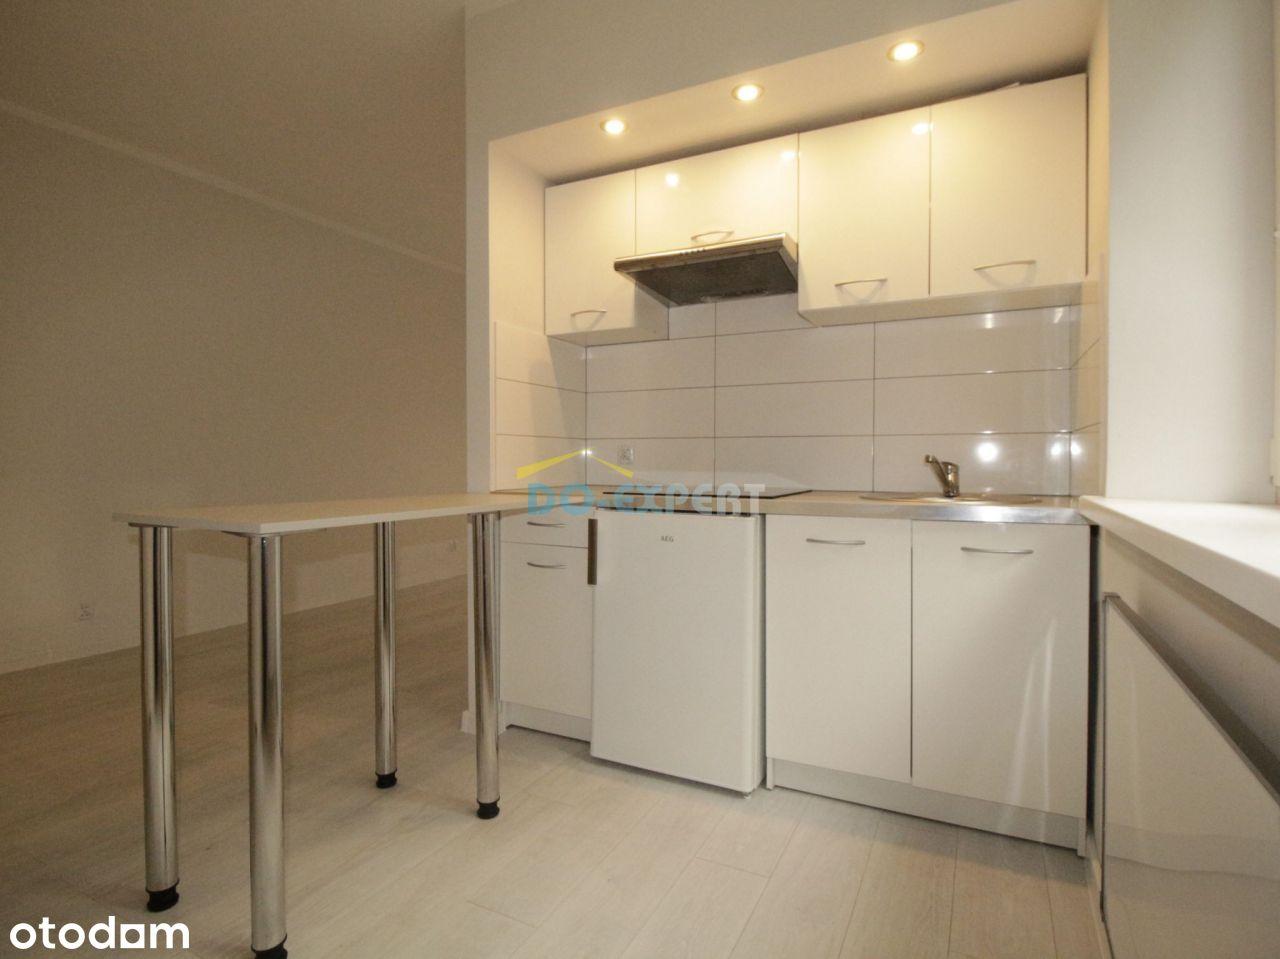 Mieszkanie po kapitalnym remoncie